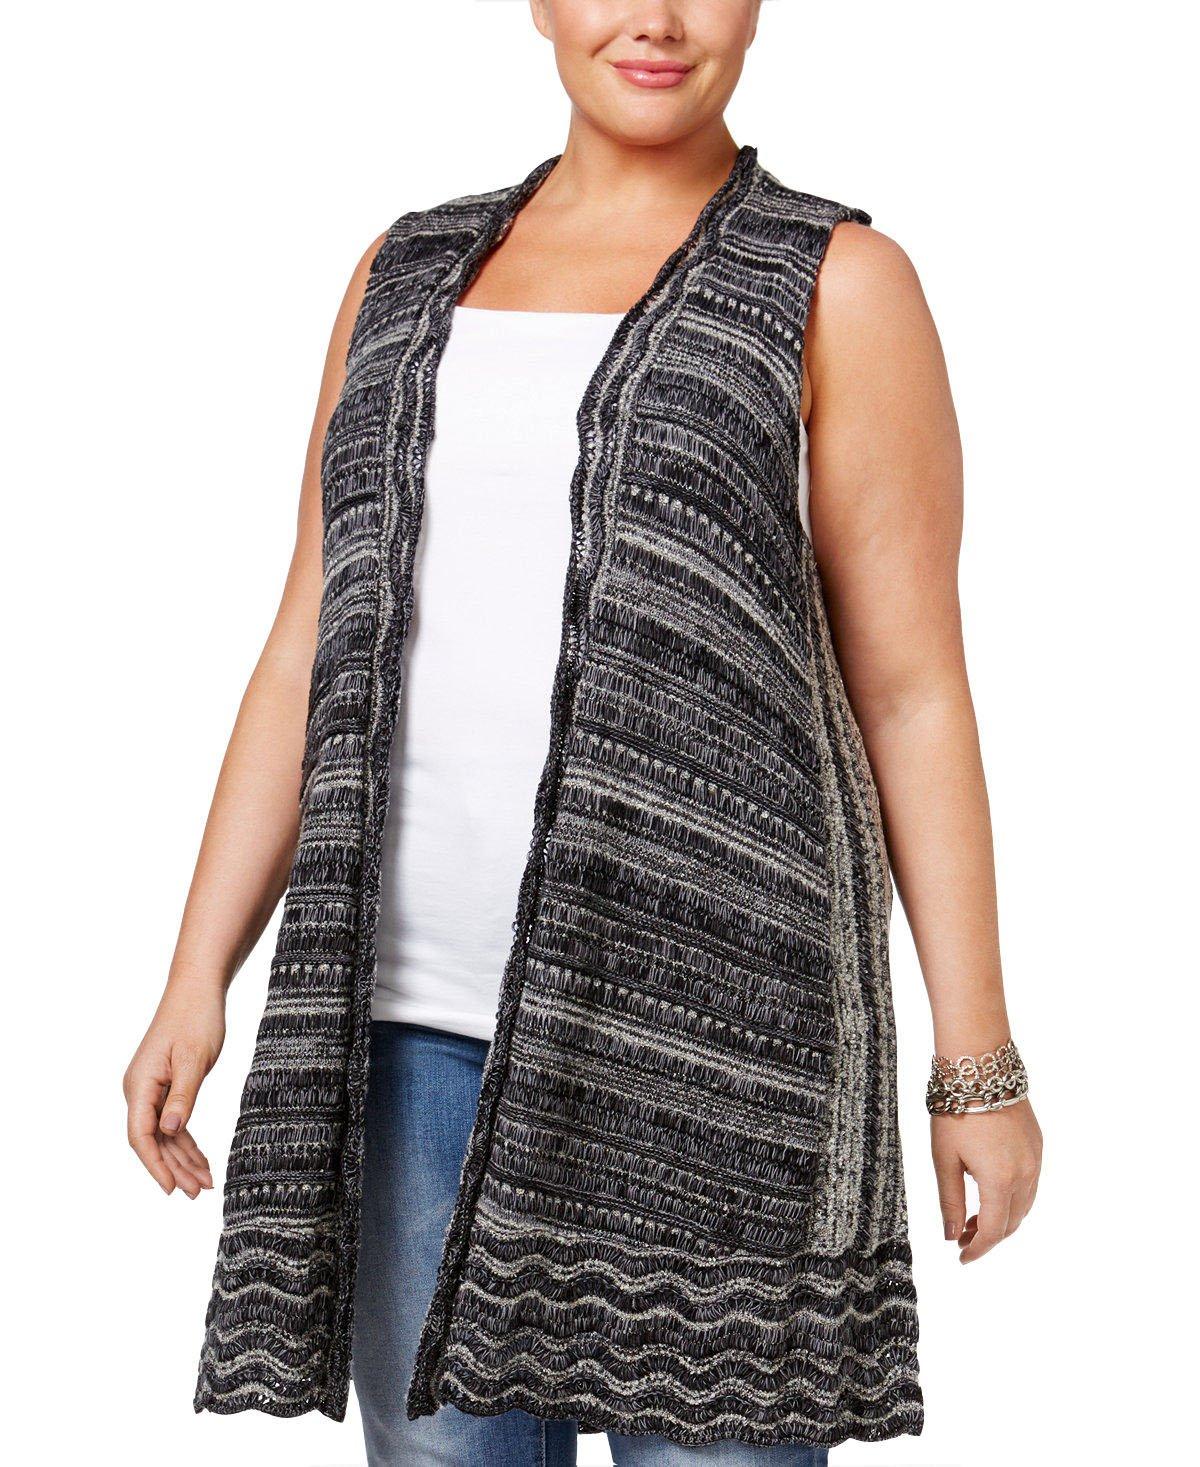 Style & Co. Womens Boucle Sweater Vest Deep Black Combo XL